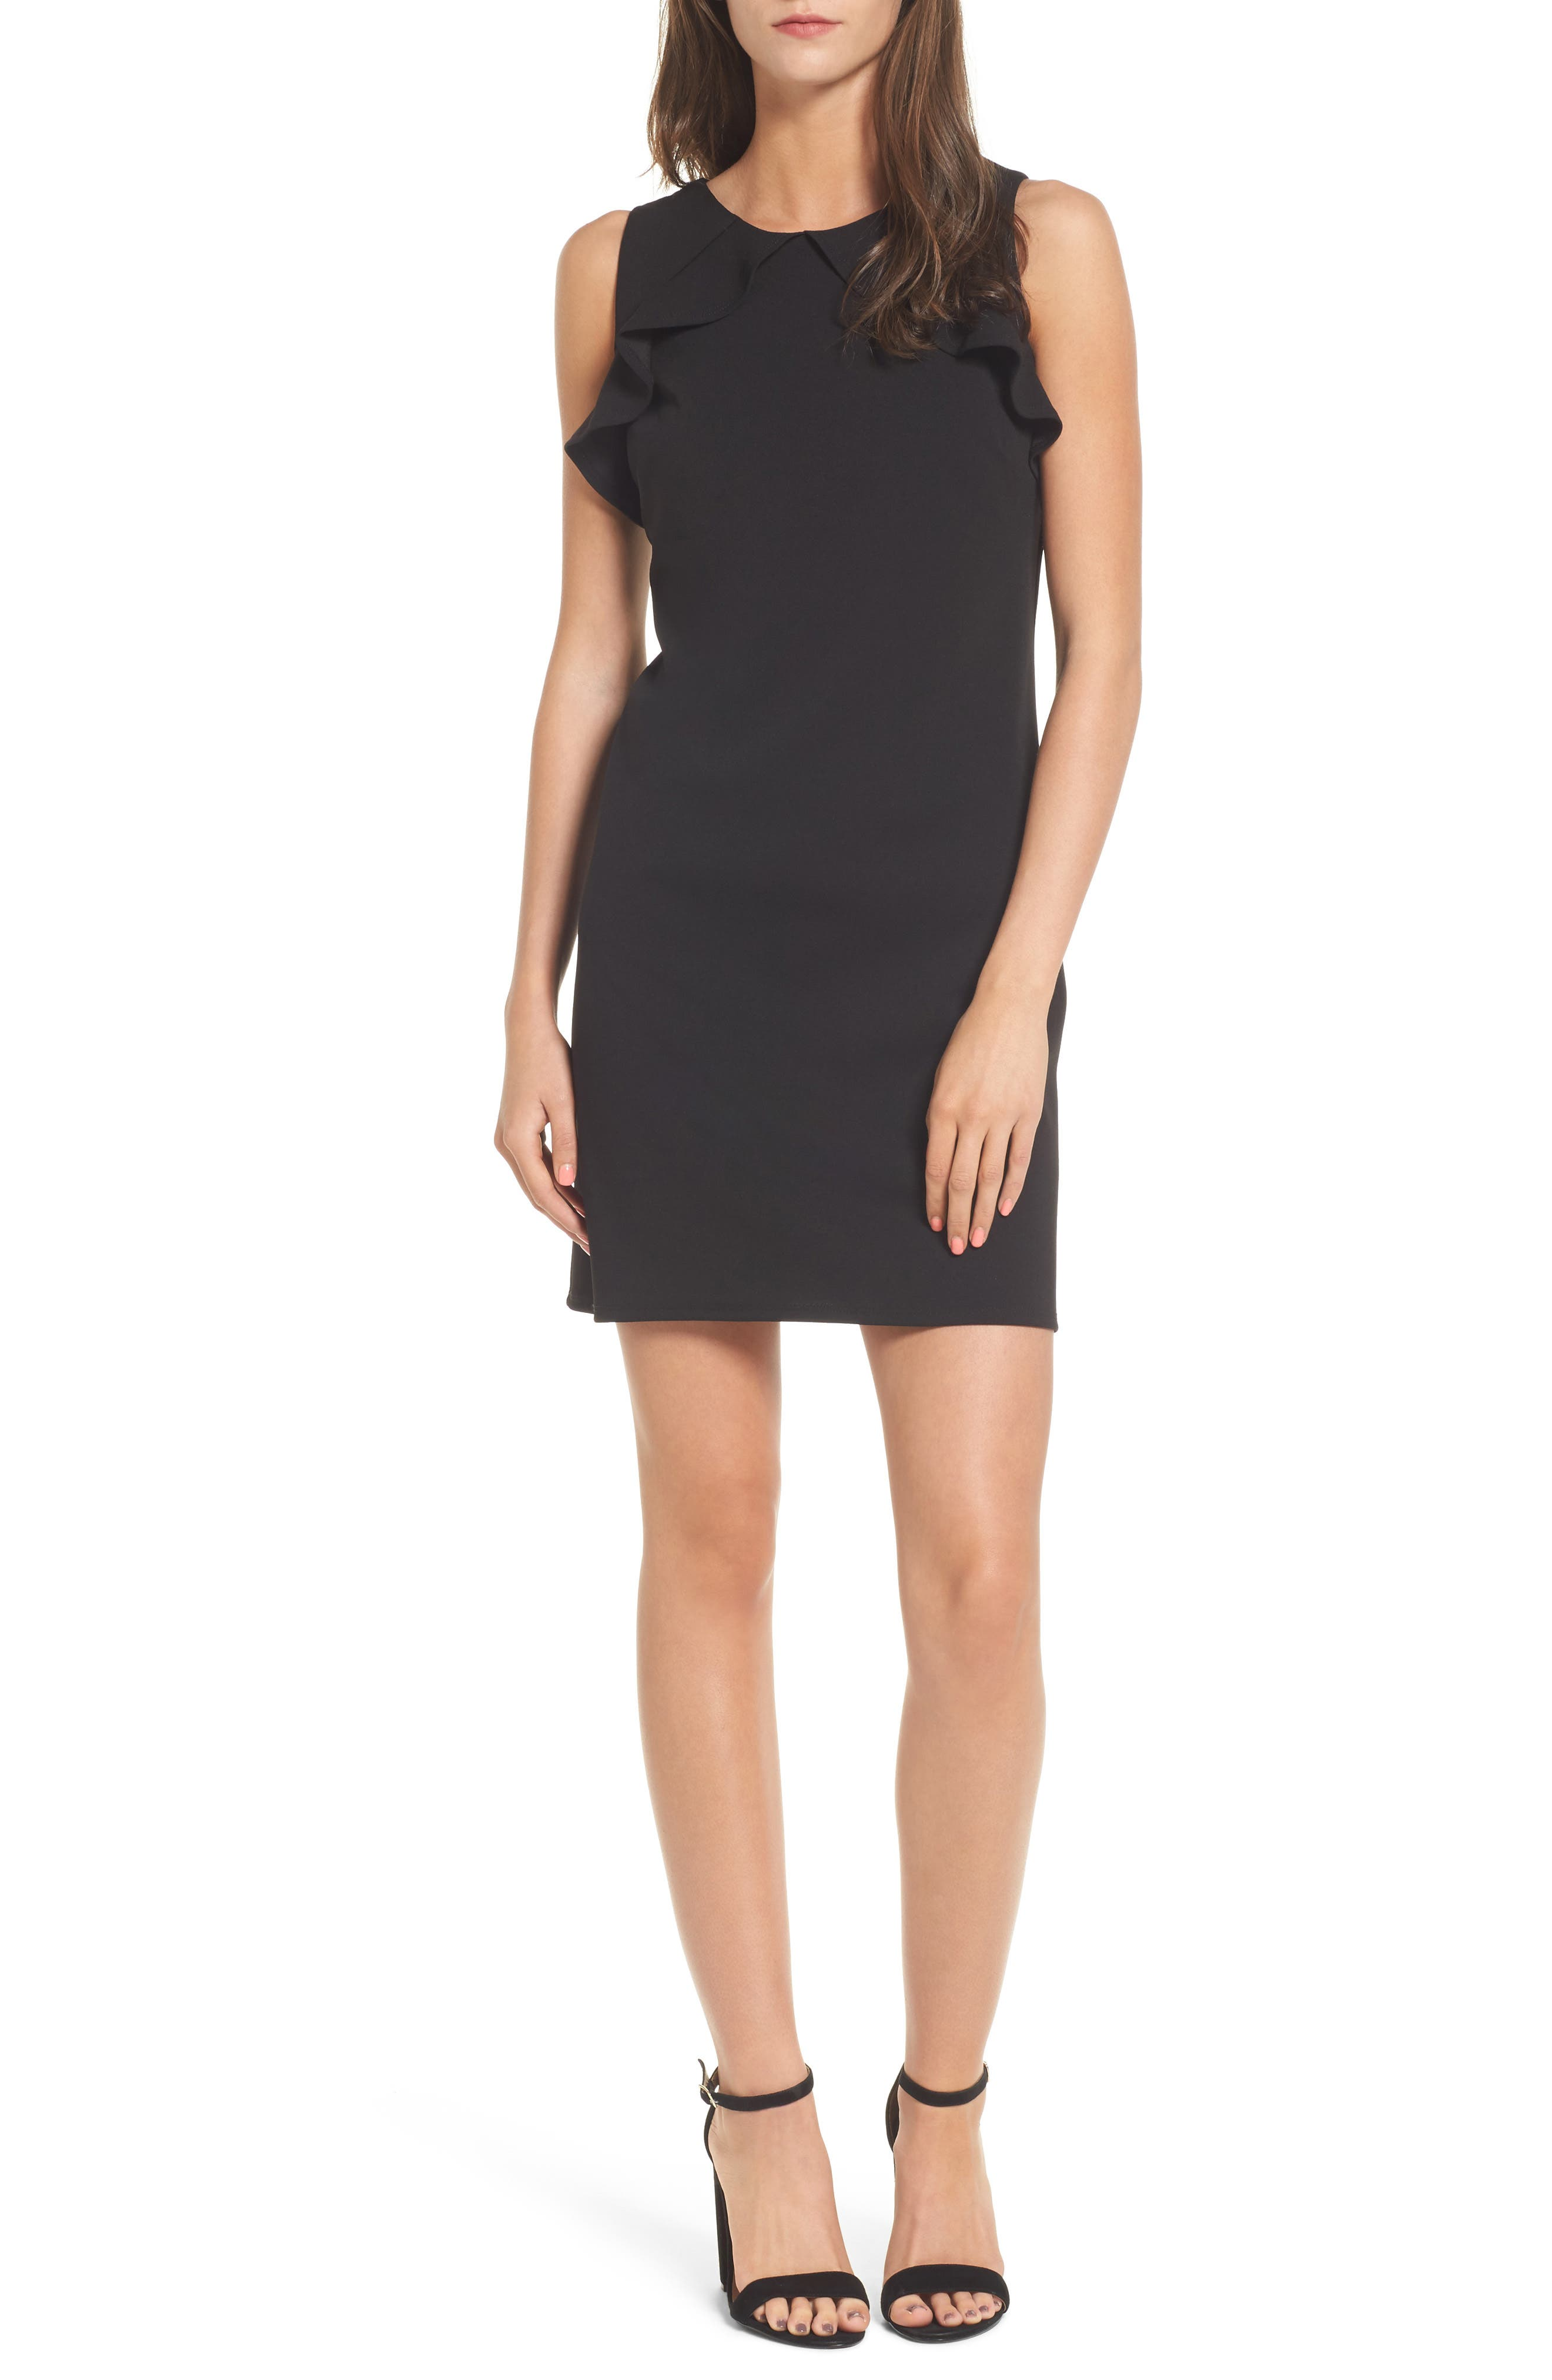 Alternate Image 1 Selected - Speechless Ruffle Sleeveless Dress